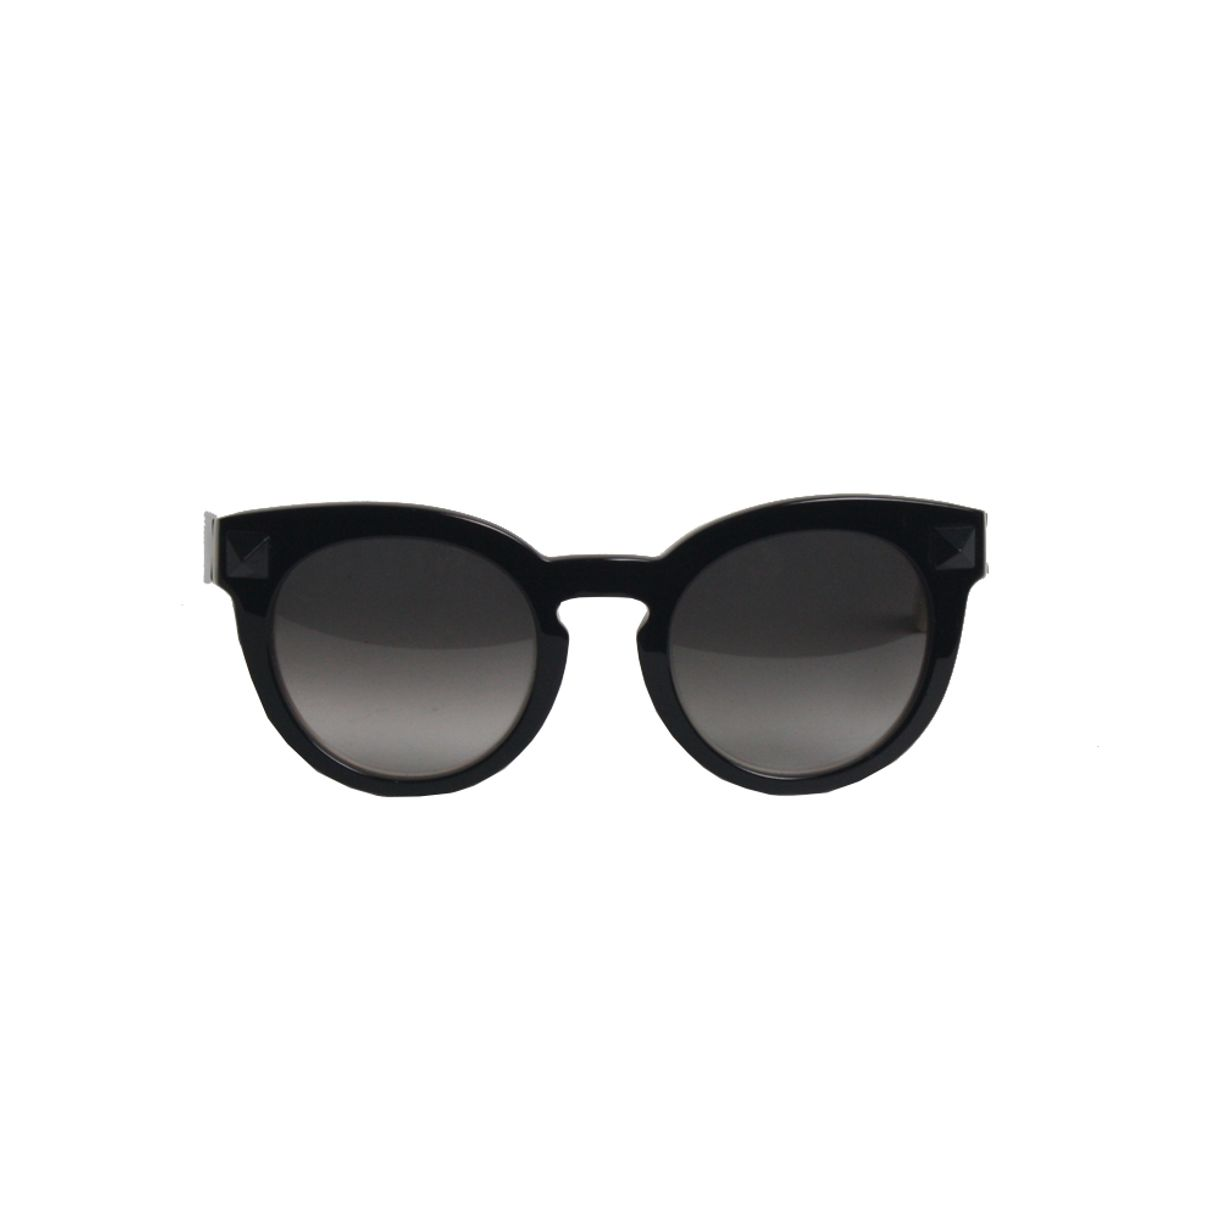 Oculos-Valentino-Rockstud-Preto-e-Marfim